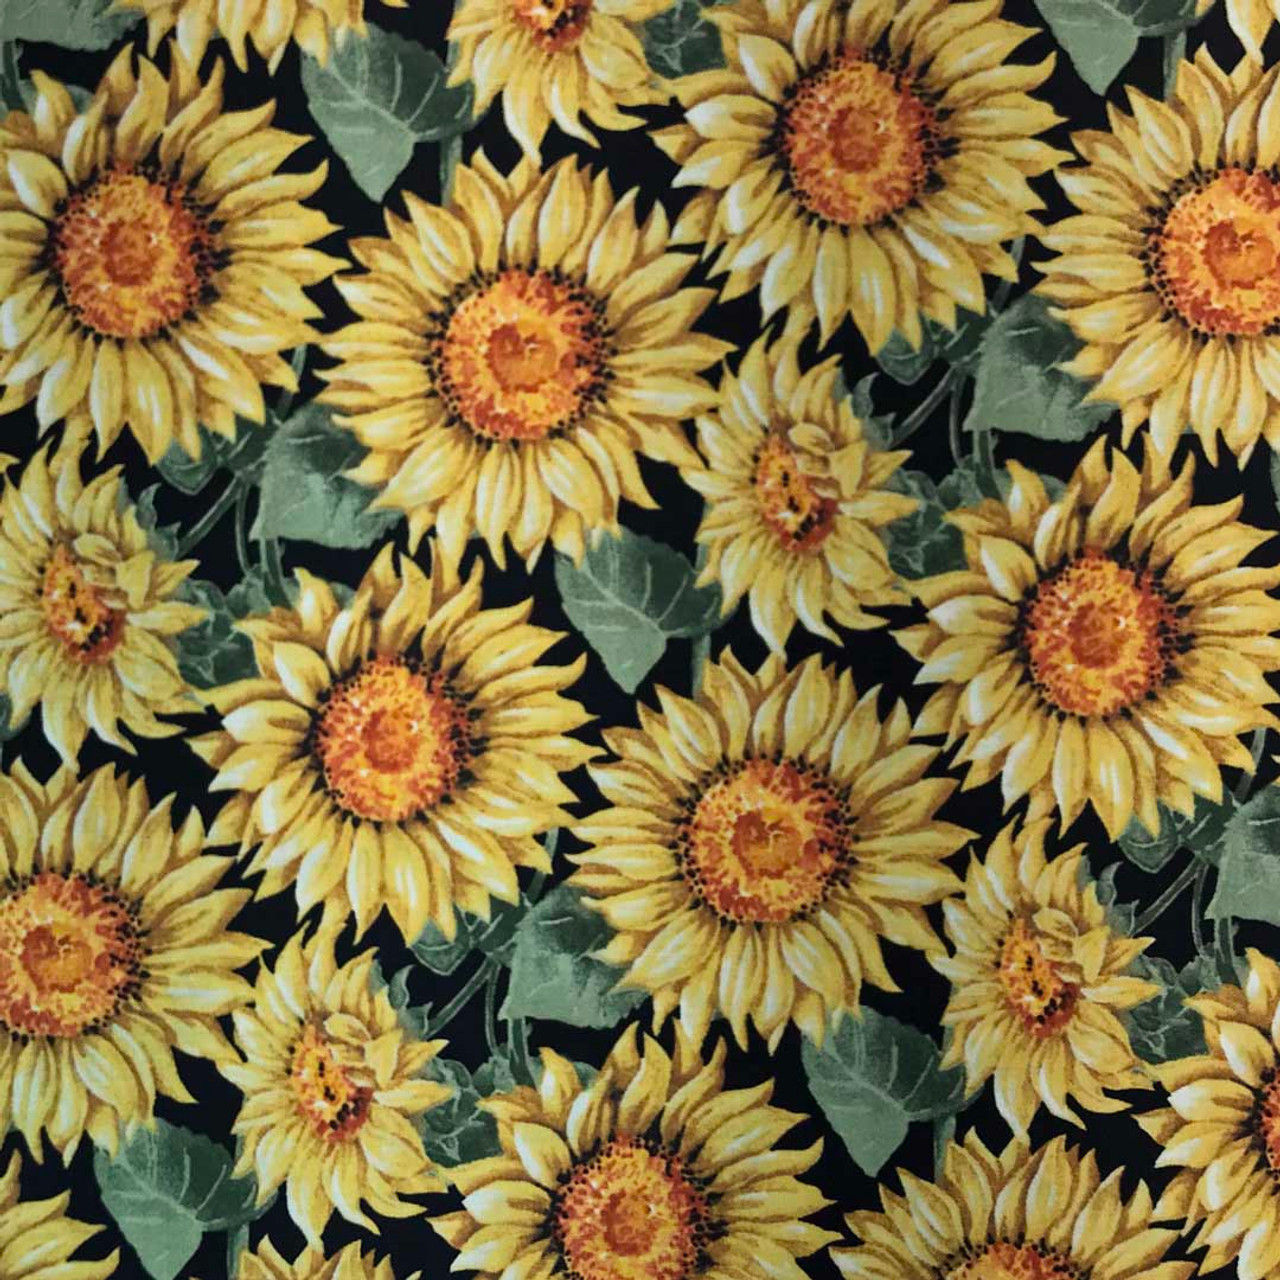 Sunflowers Microwave Heating Pad